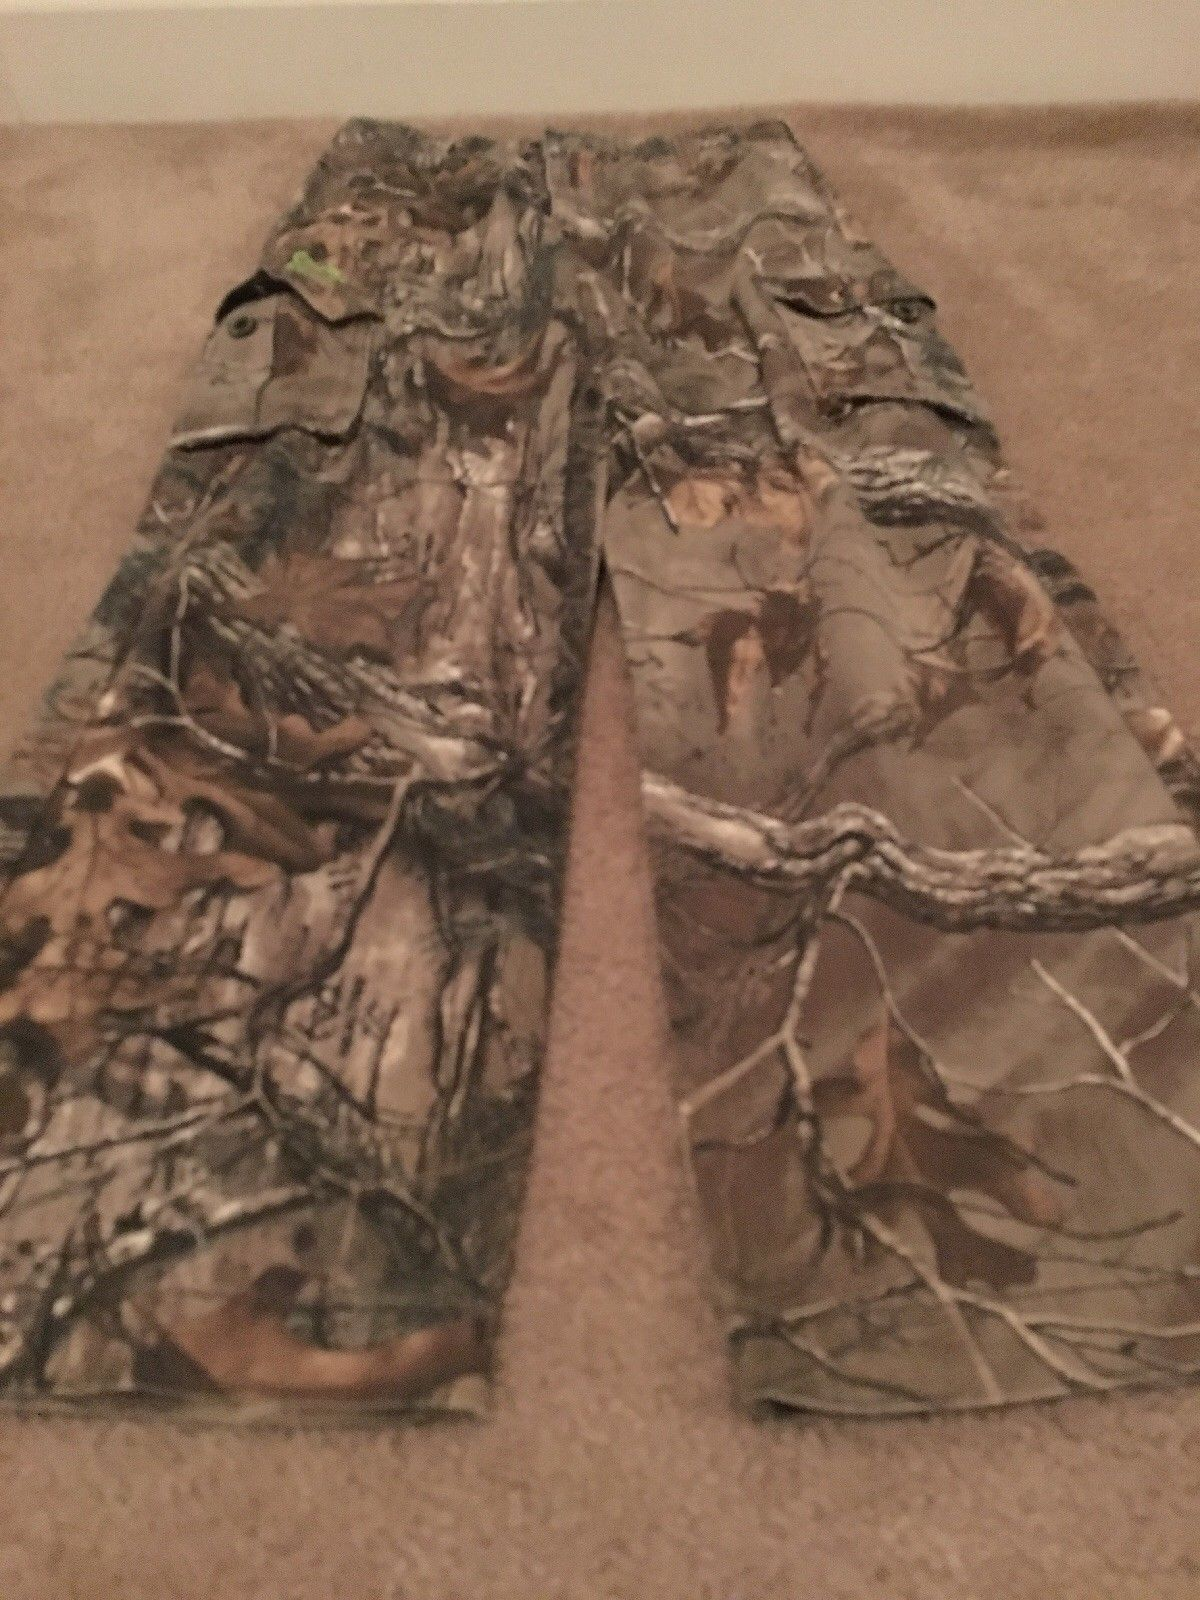 042d5411d5f92 Realtree Boy's Hunting Pants Sz XL 14/16 and 50 similar items. S l1600